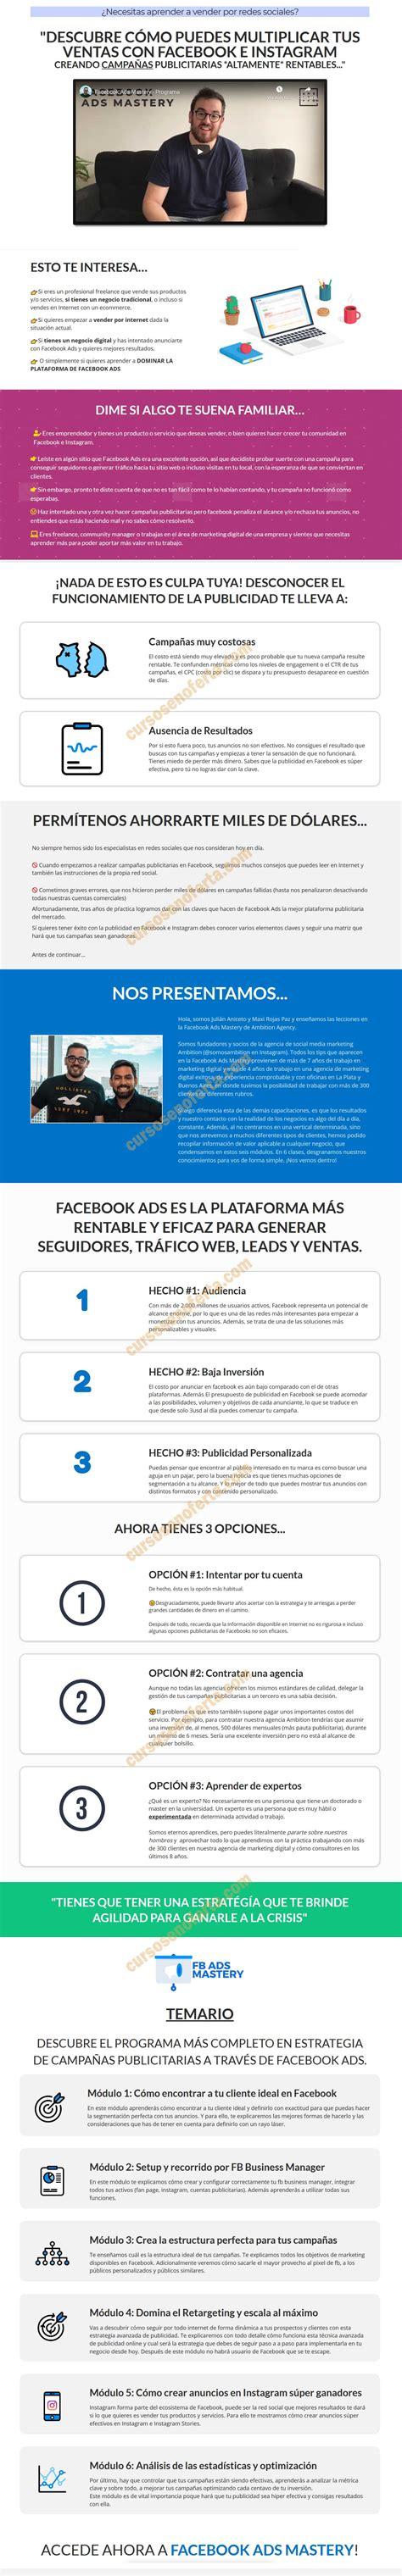 Facebook Ads Mastery - cursosenoferta.com